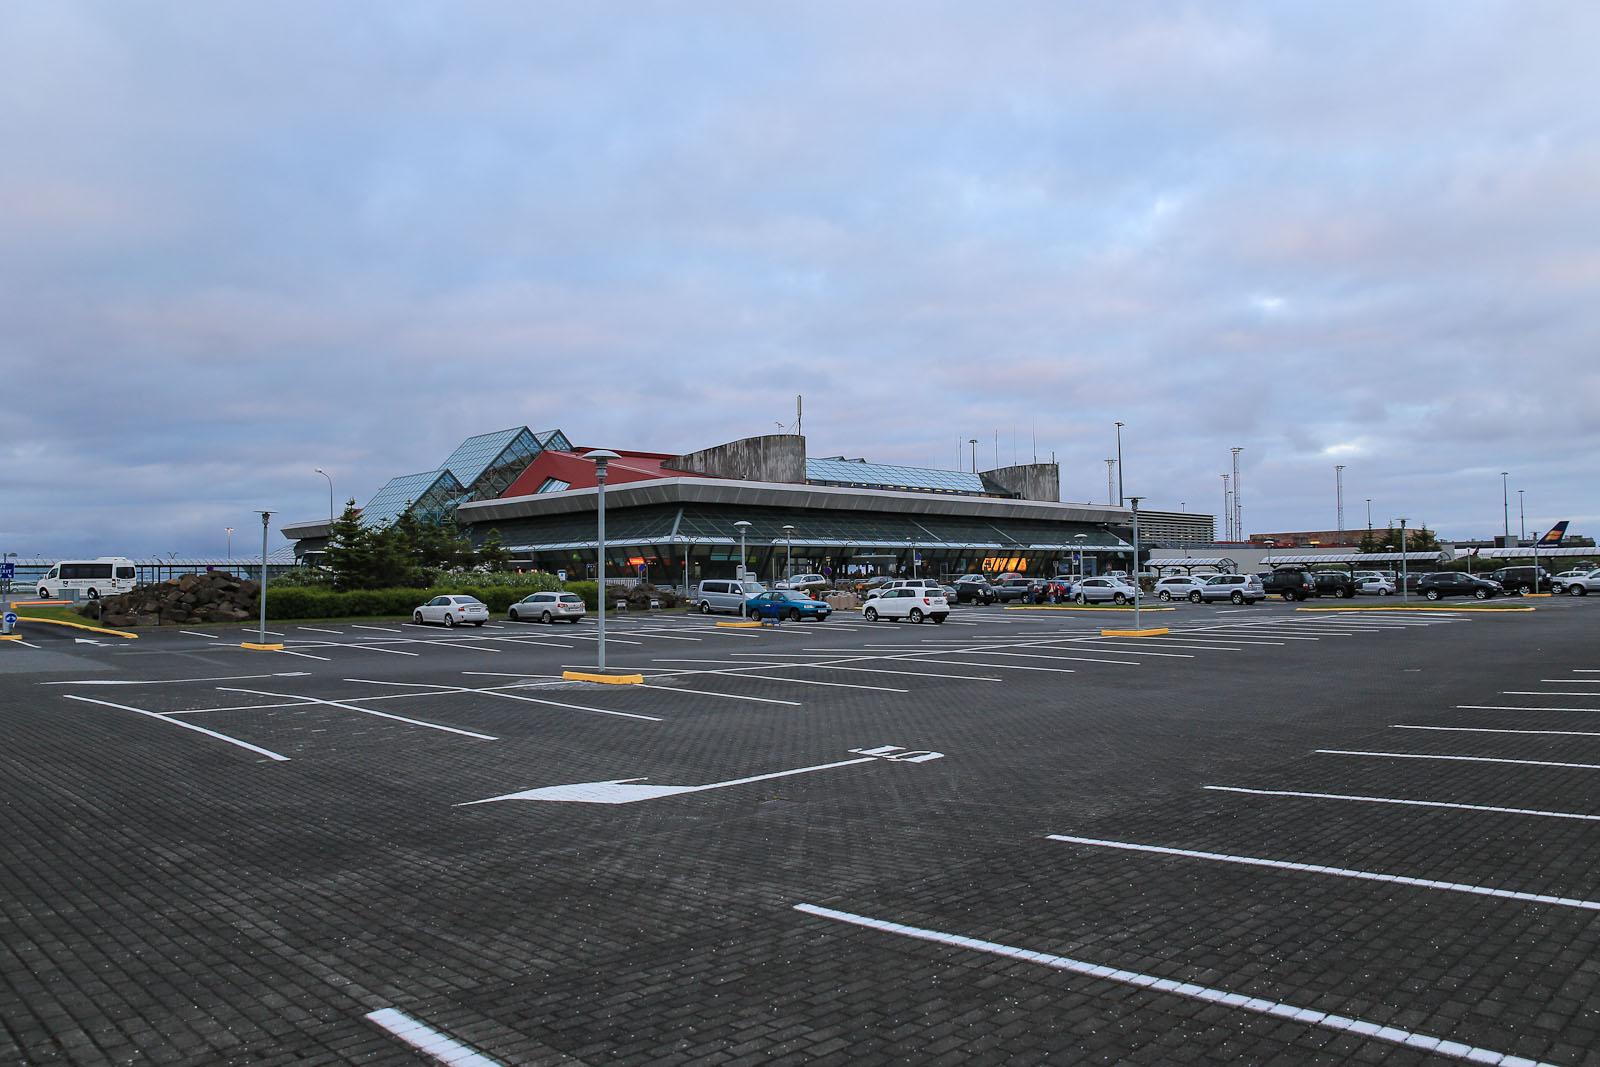 Пассажирский терминал аэропорта Рейкьявик Кефлавик